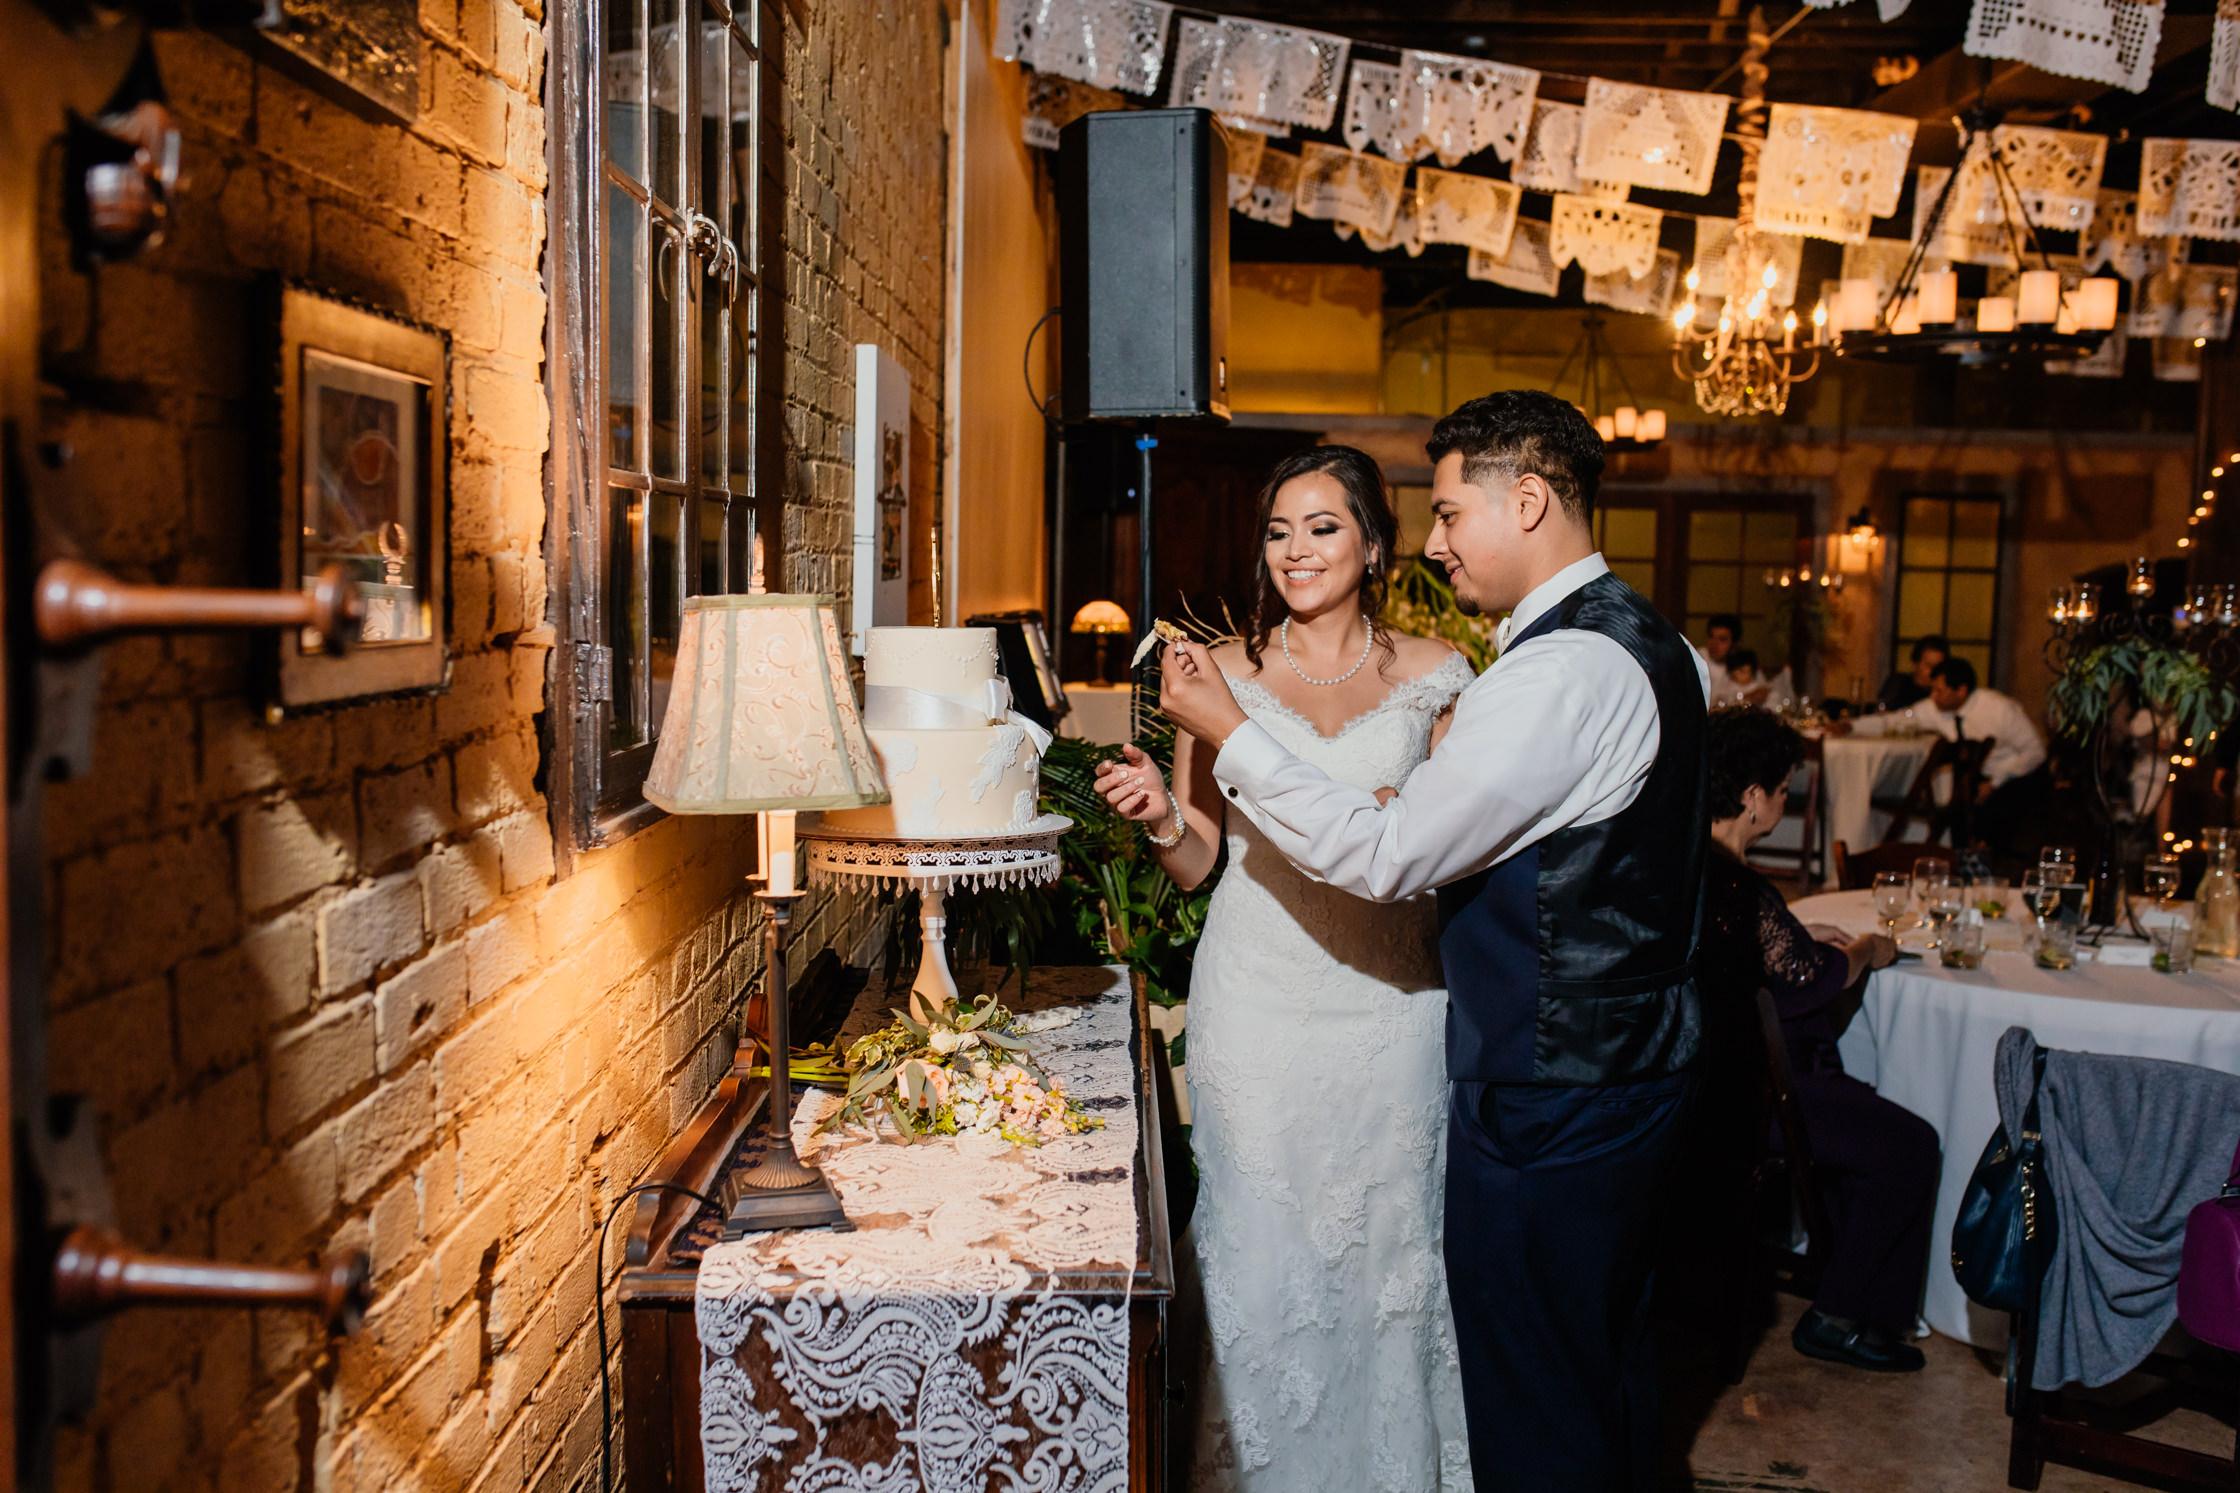 luis_joanna_wedding-103.jpg